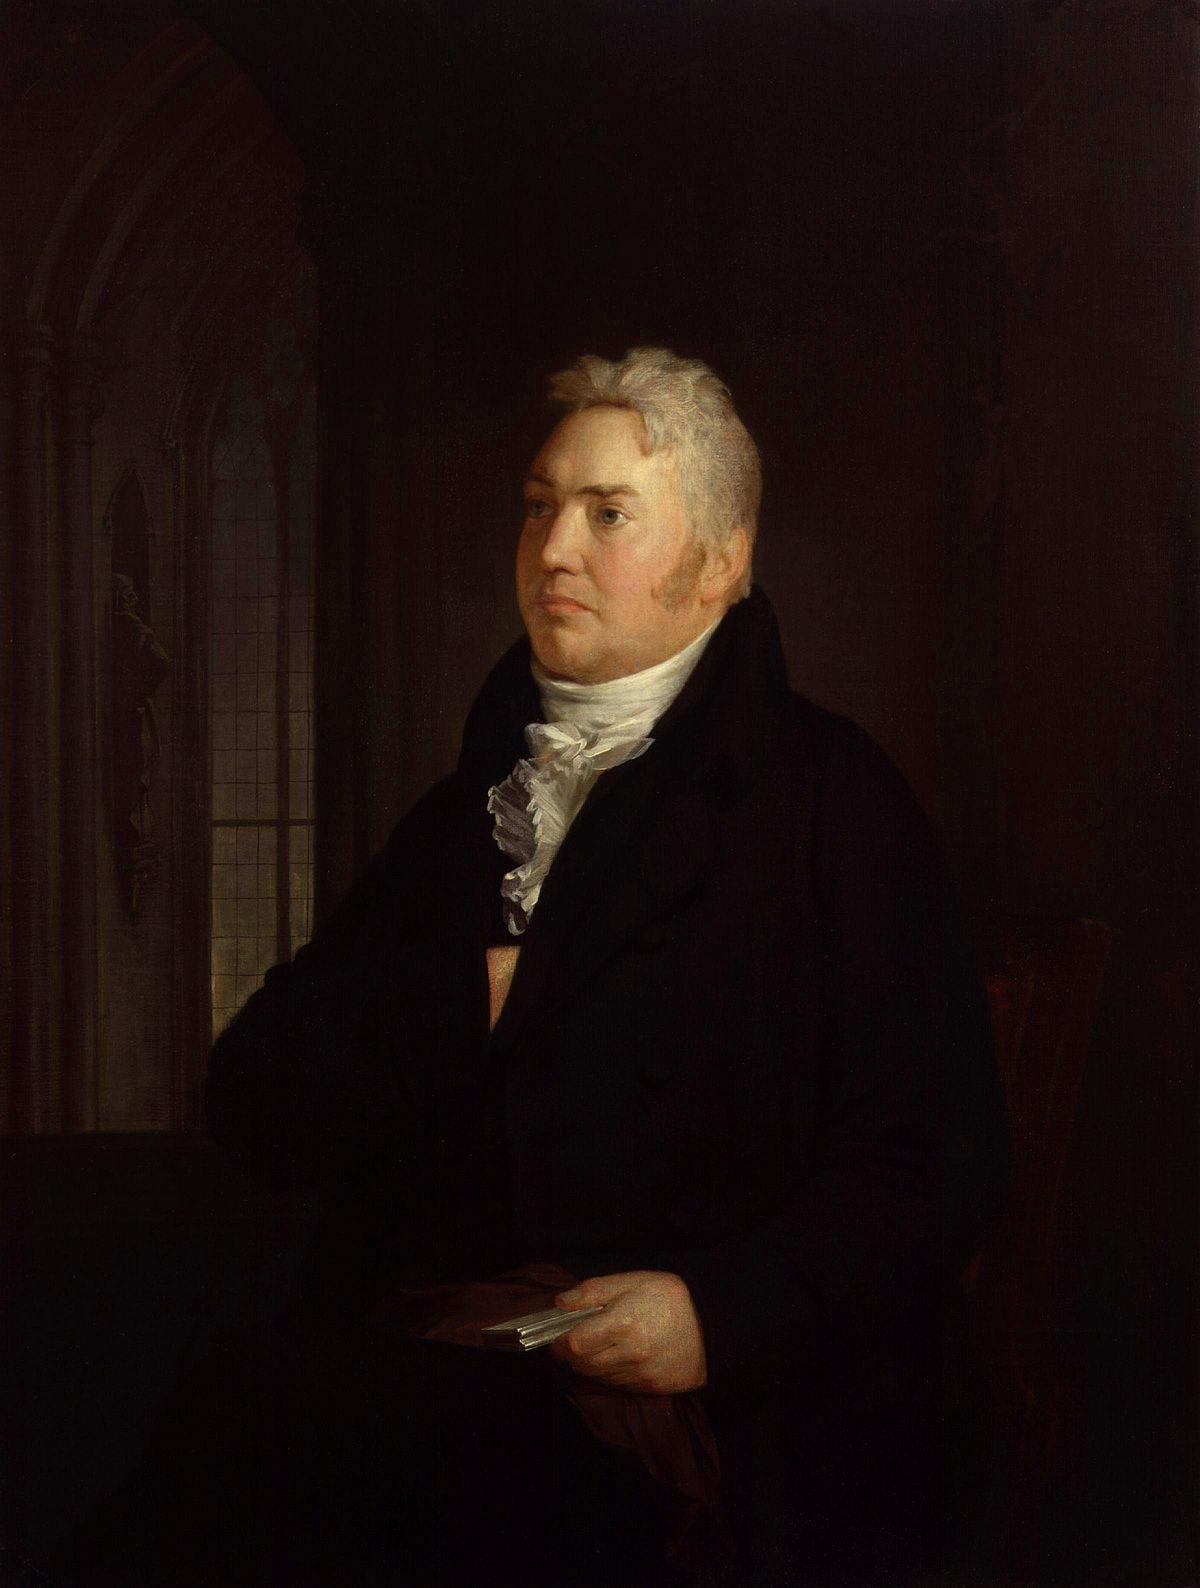 Samuel Taylor Coleridge - Wikipedia, la enciclopedia libre